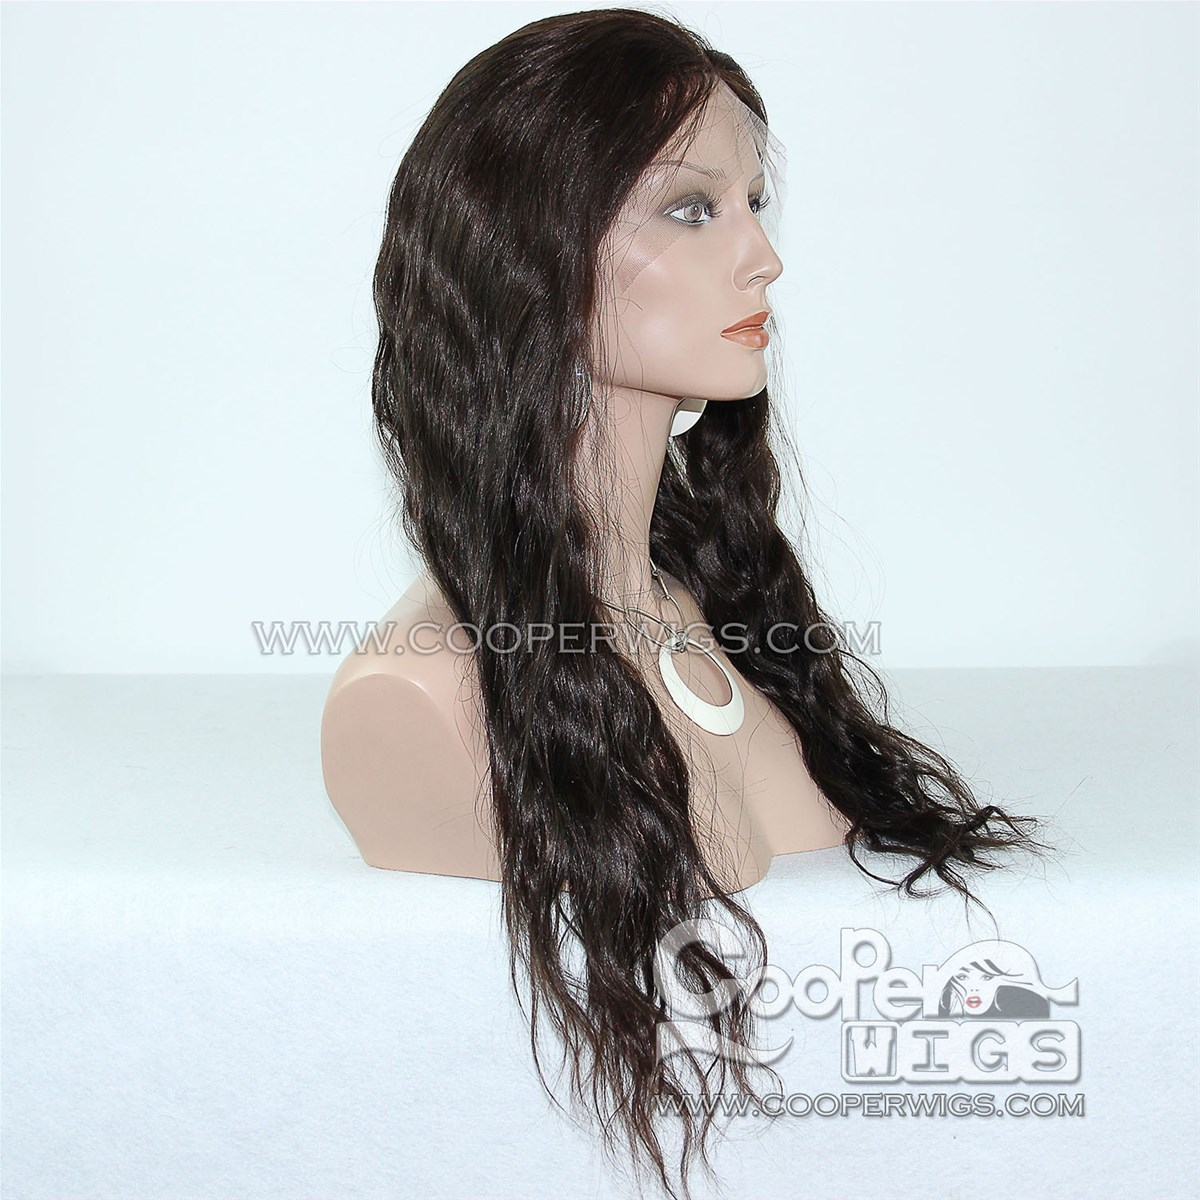 Cooper Wigs WEAVE BEAUTY Lace Front Human Hair Wigs Bob Wig Wig for Black Women Brazilian